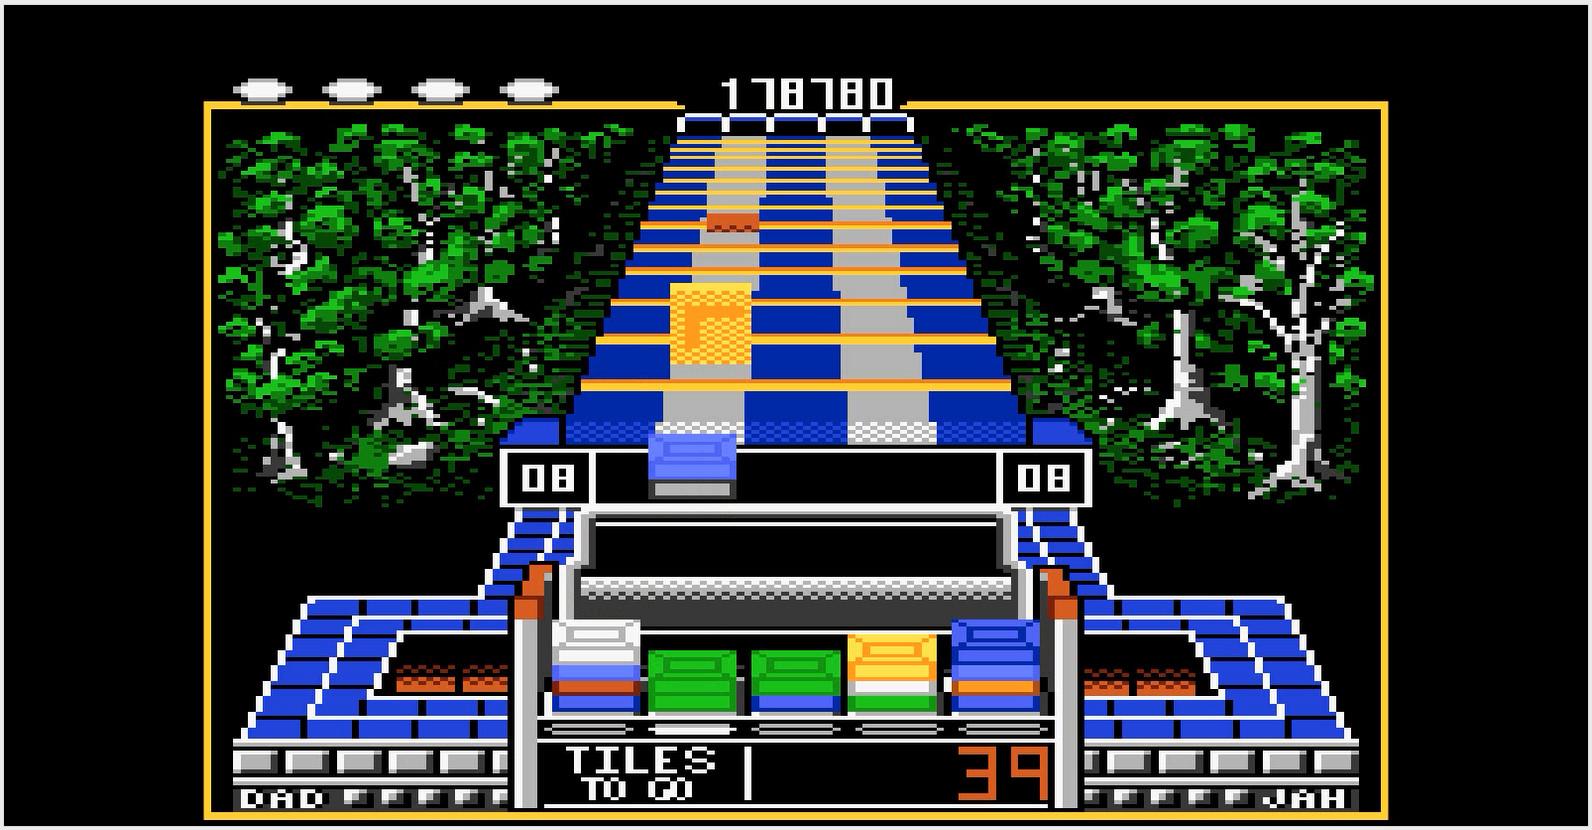 Scrabbler15: Klax: Hard [Level 06 Start] (Atari 7800 Emulated) 178,780 points on 2015-01-17 17:51:41